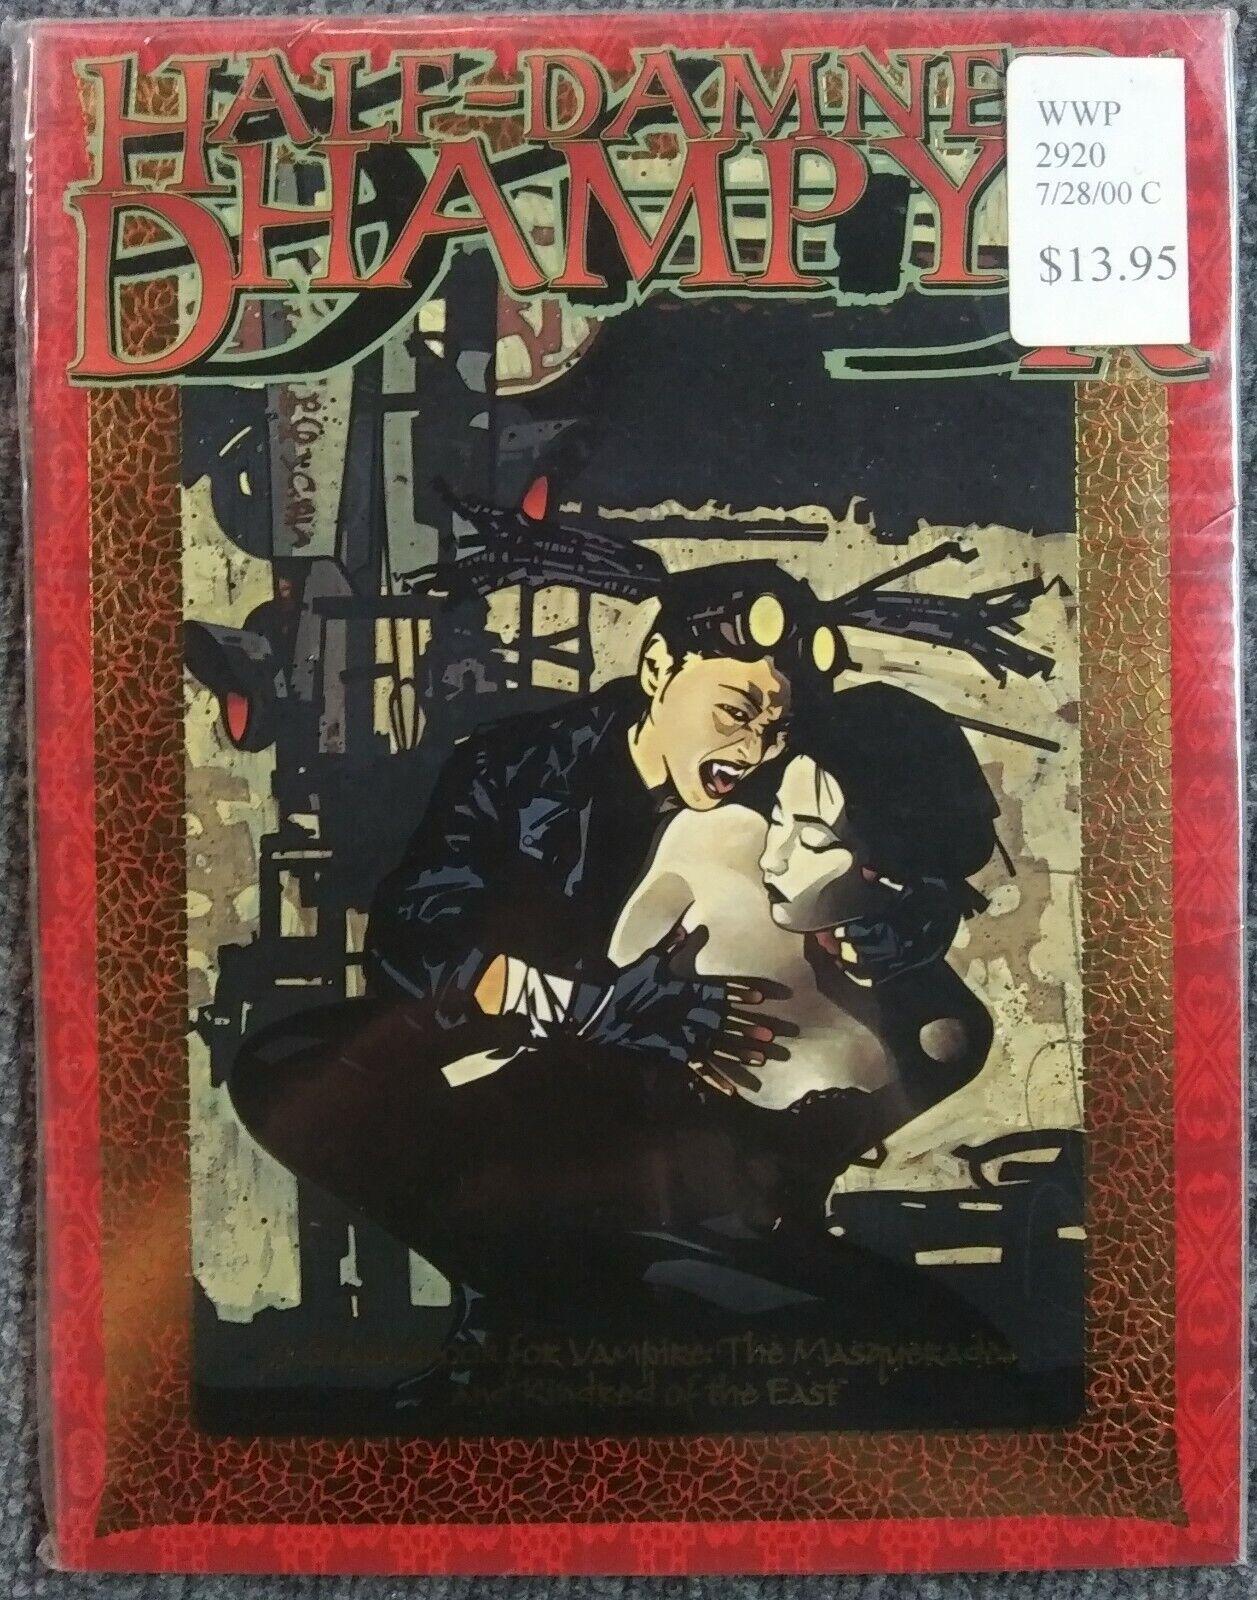 Half-Damned   Dhampyr - Vampire  The Masquerade RPG Sealed nuovo SC bianca Wolf  in vendita online